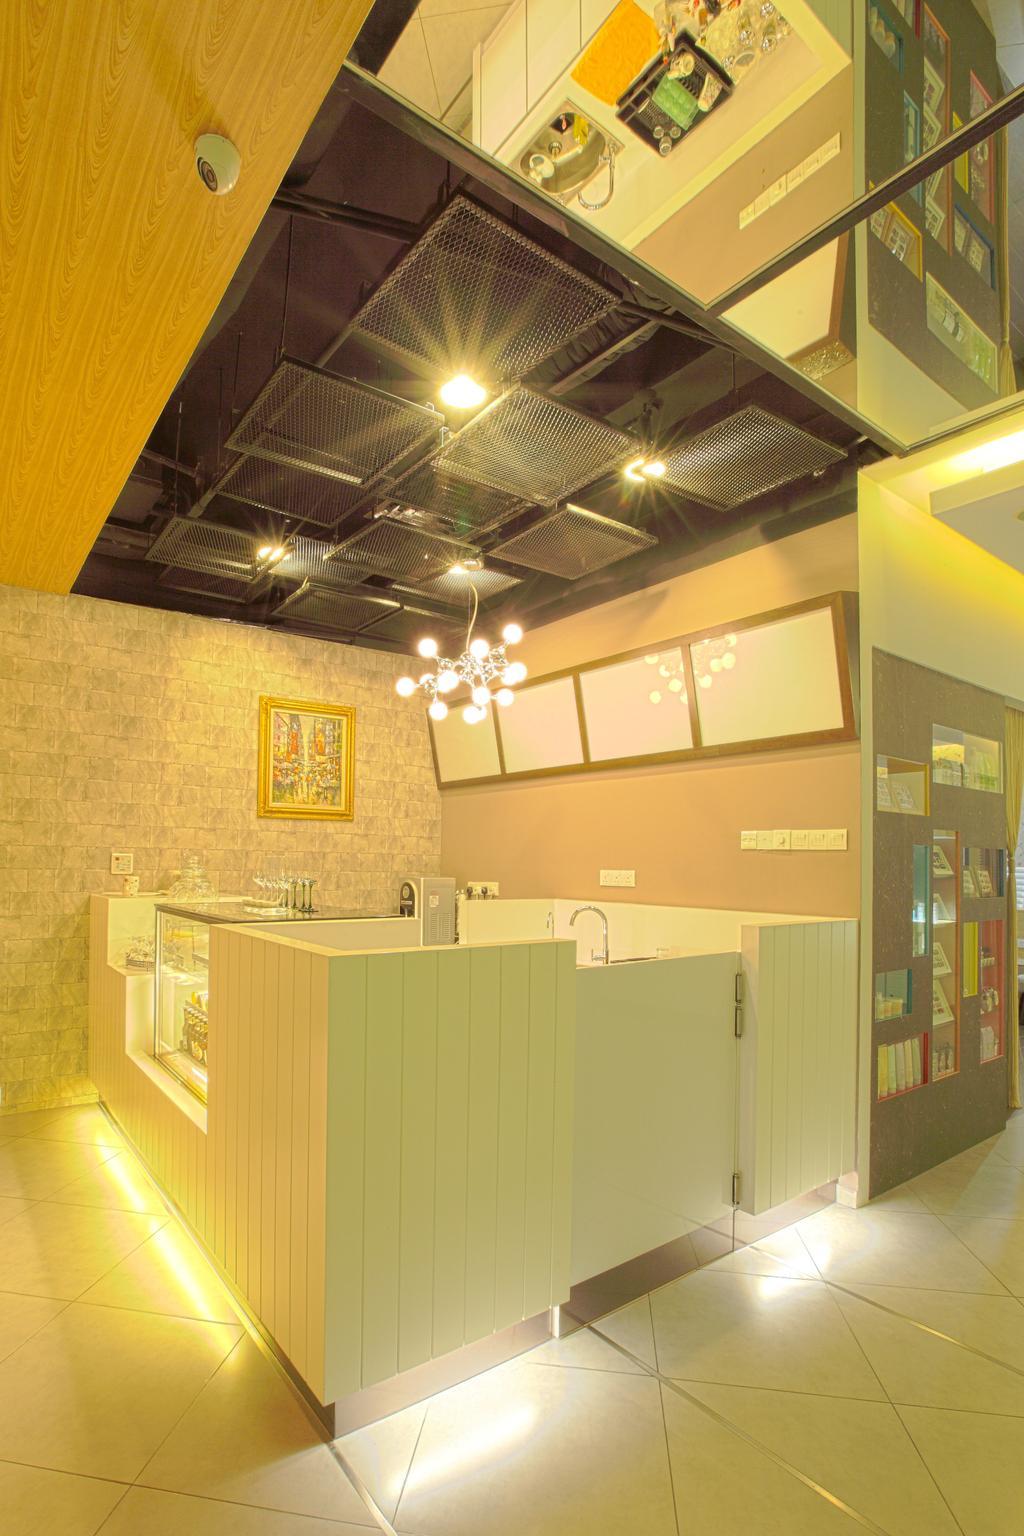 Estuary Spa, Jalan Klang Lama, Commercial, Interior Designer, GI Design Sdn Bhd, Contemporary, Modern